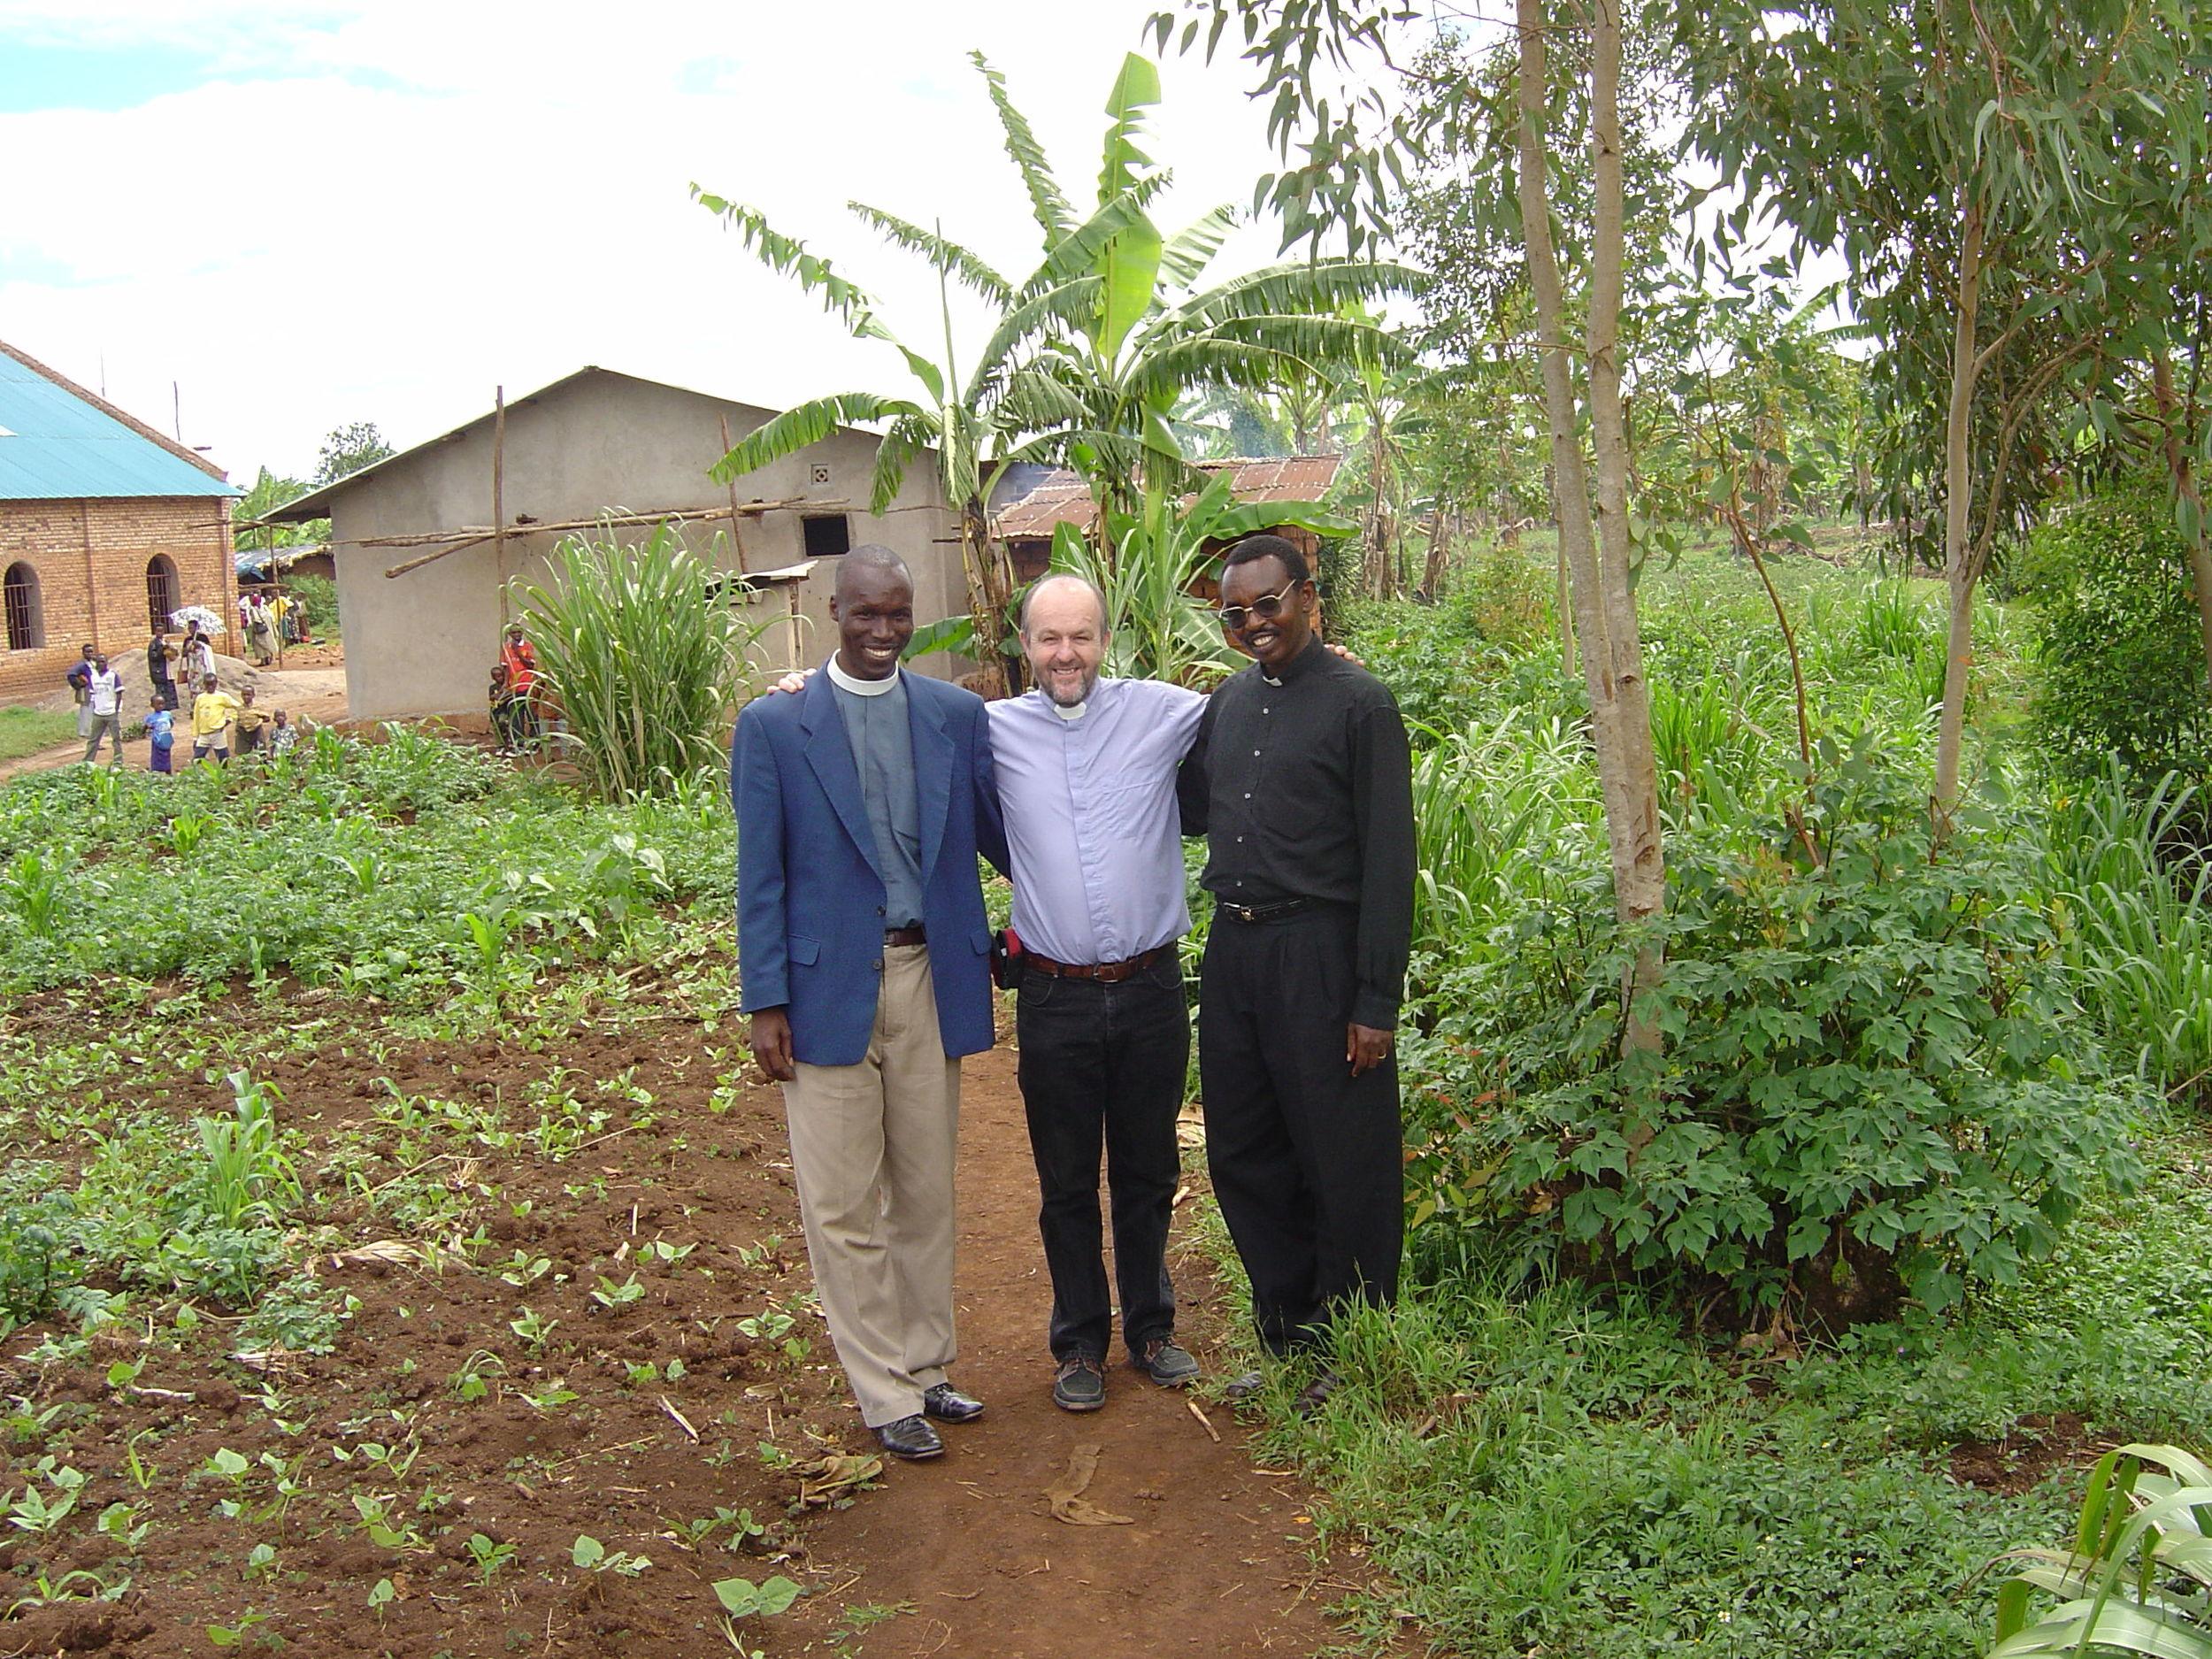 Earl Storey - Delivering Peace Building Training in Rwanda